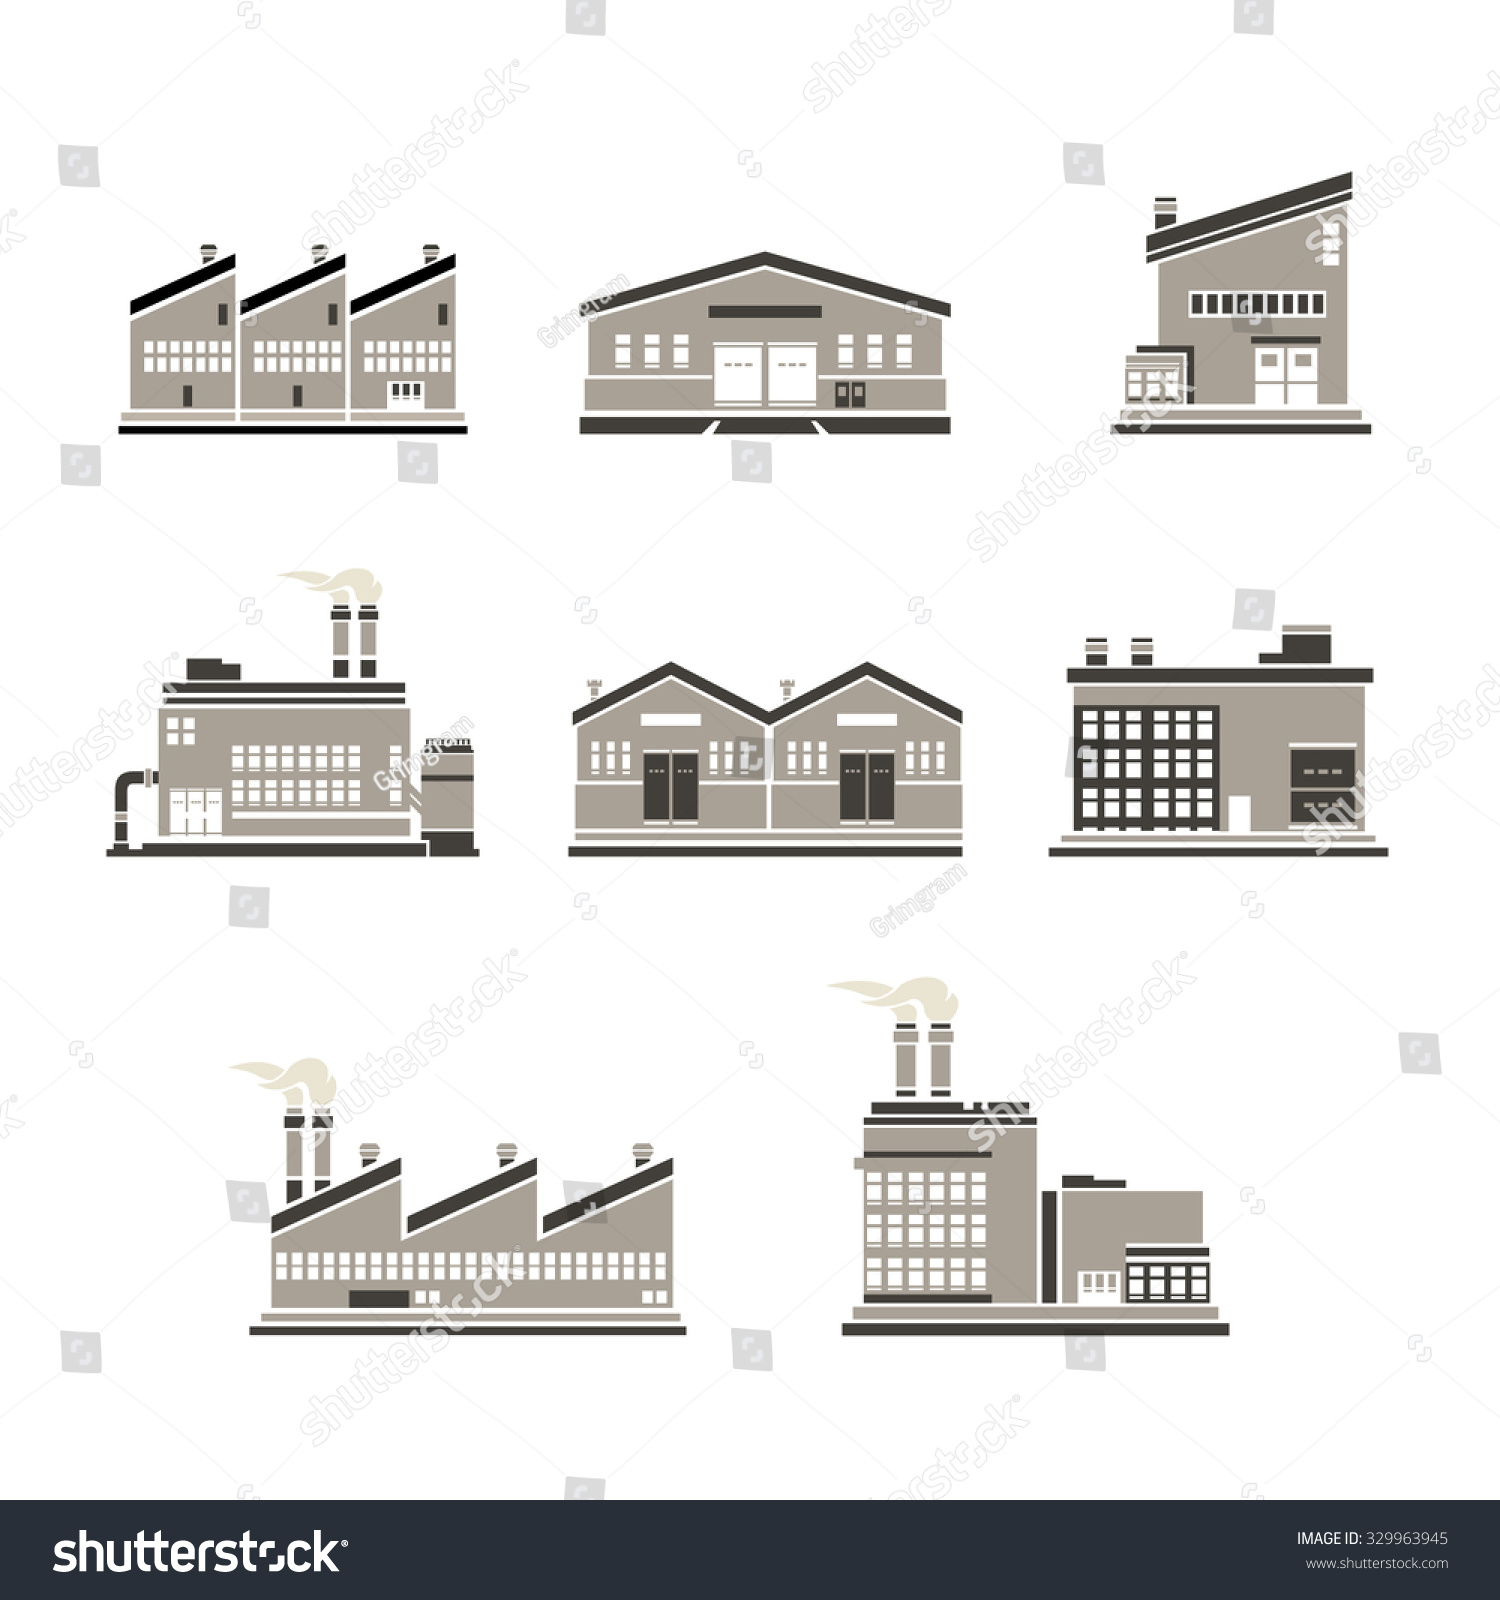 Distribution Center Clip Art – Cliparts